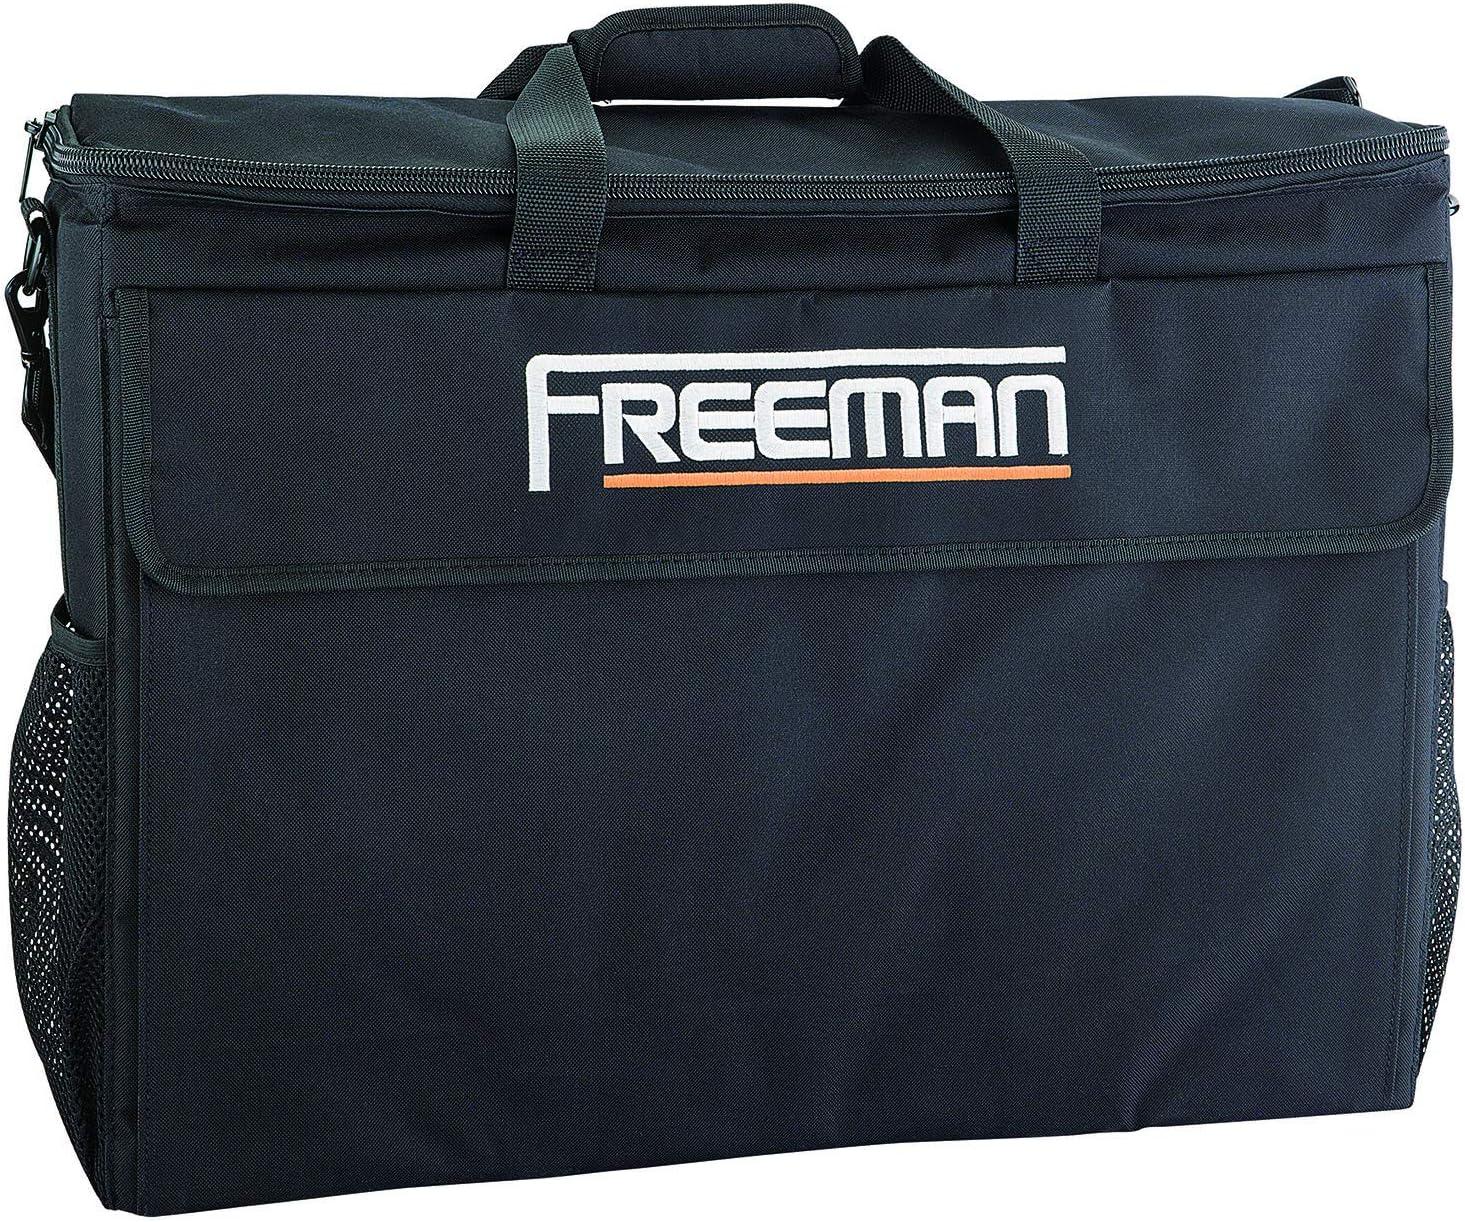 "Freeman FTBRC01 23"" Heavy Duty Tool Bag with Padded Handle"